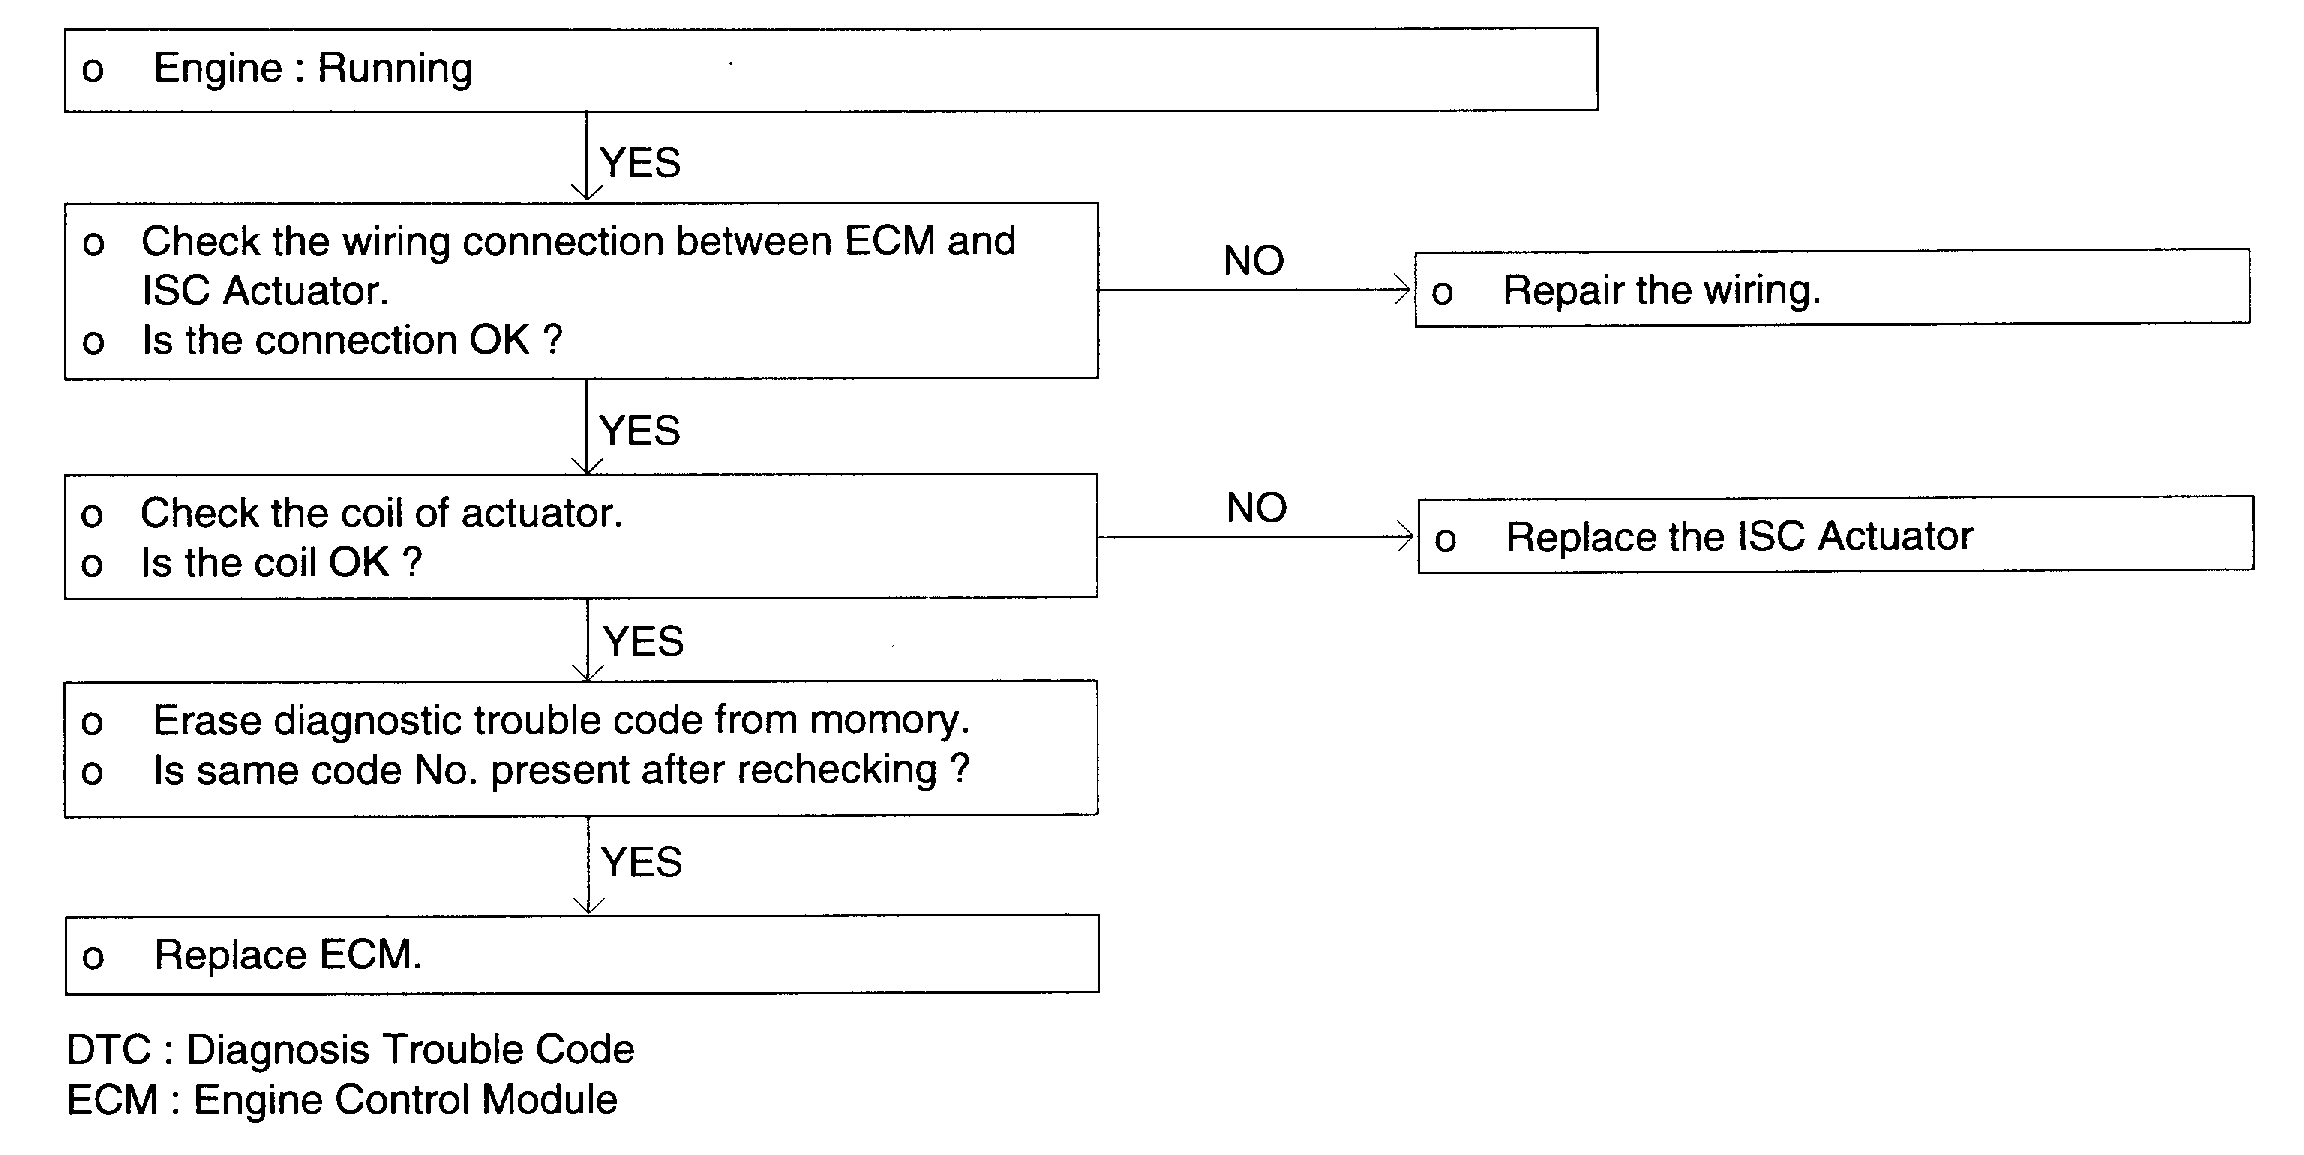 Ecm Sees 100 Tps At All Times Sensor Checks Ok Wiring To Number On Check 9e25abcb A32d 4f72 B9e4 9e25abc